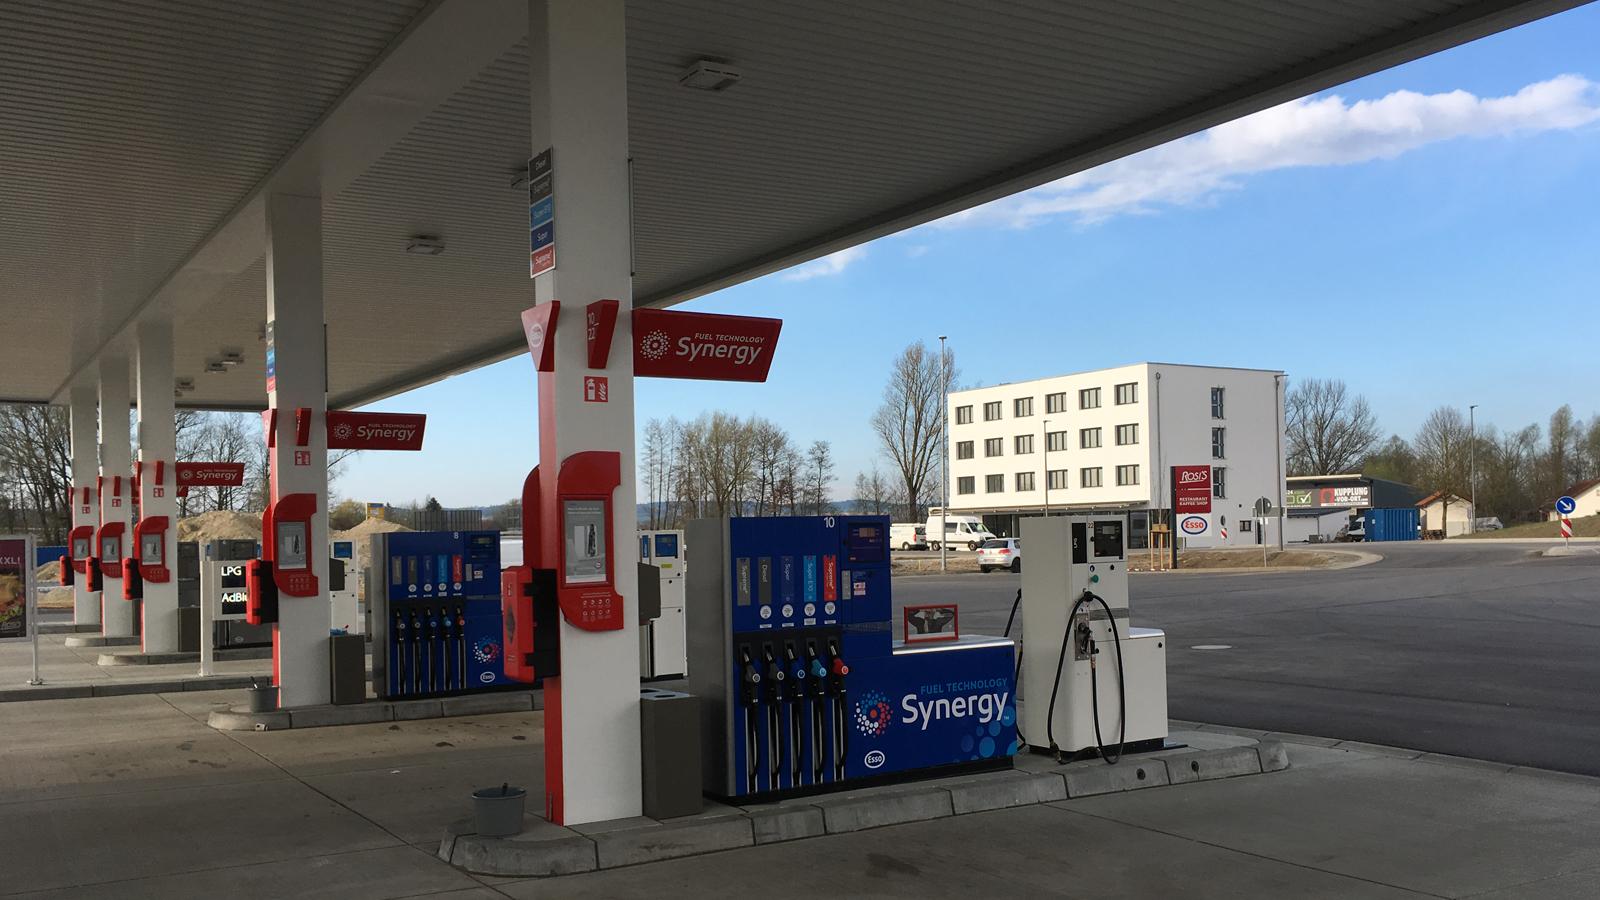 Autohof Tankstelle Pilsting, Koenigs Rütter Architekten, Architekt Bonn